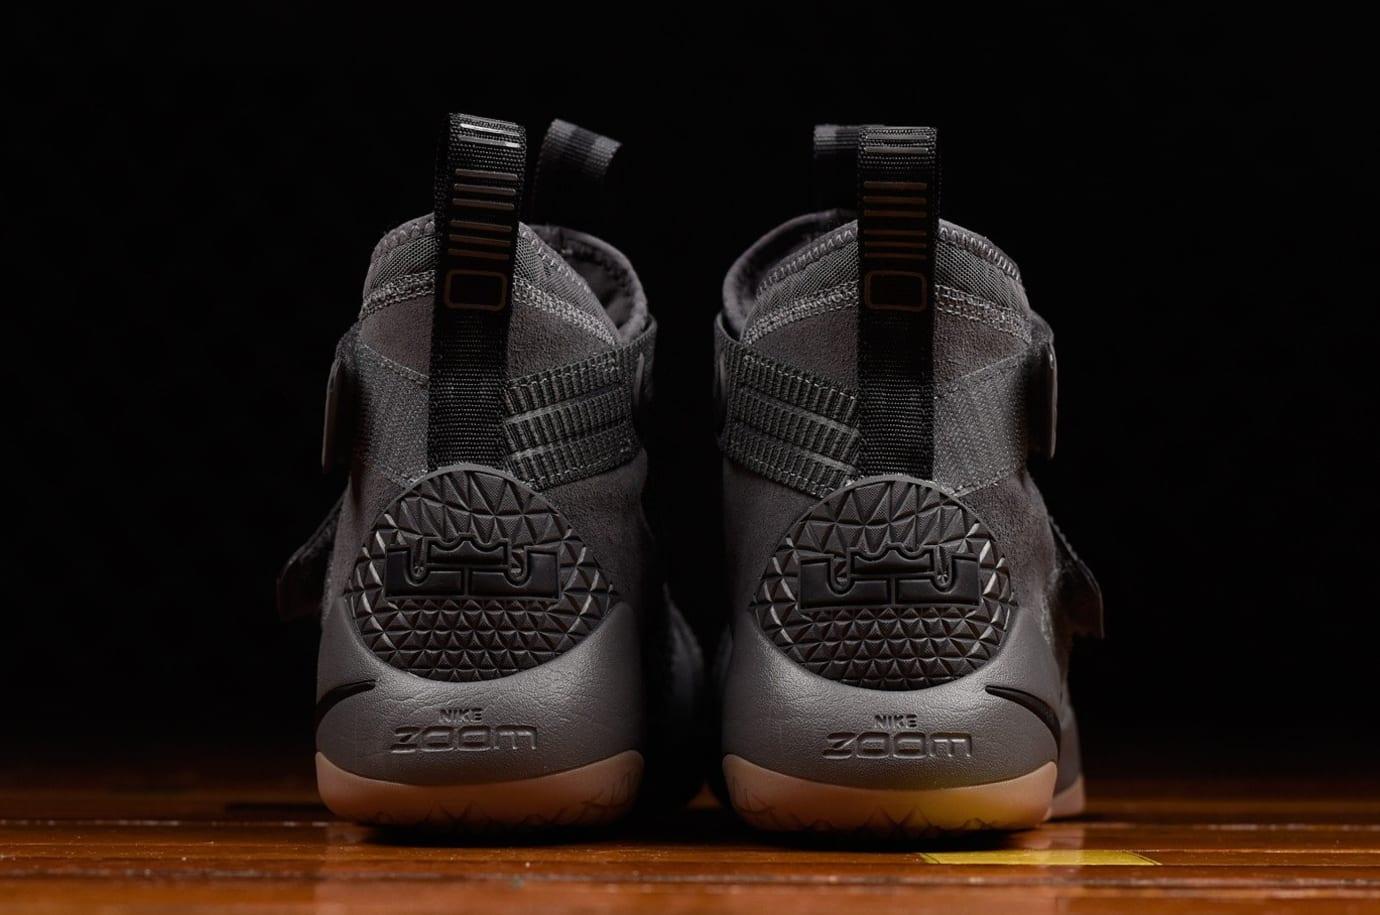 Nike LeBron Soldier 11 Grey Gum Release Date Heel 897646-003